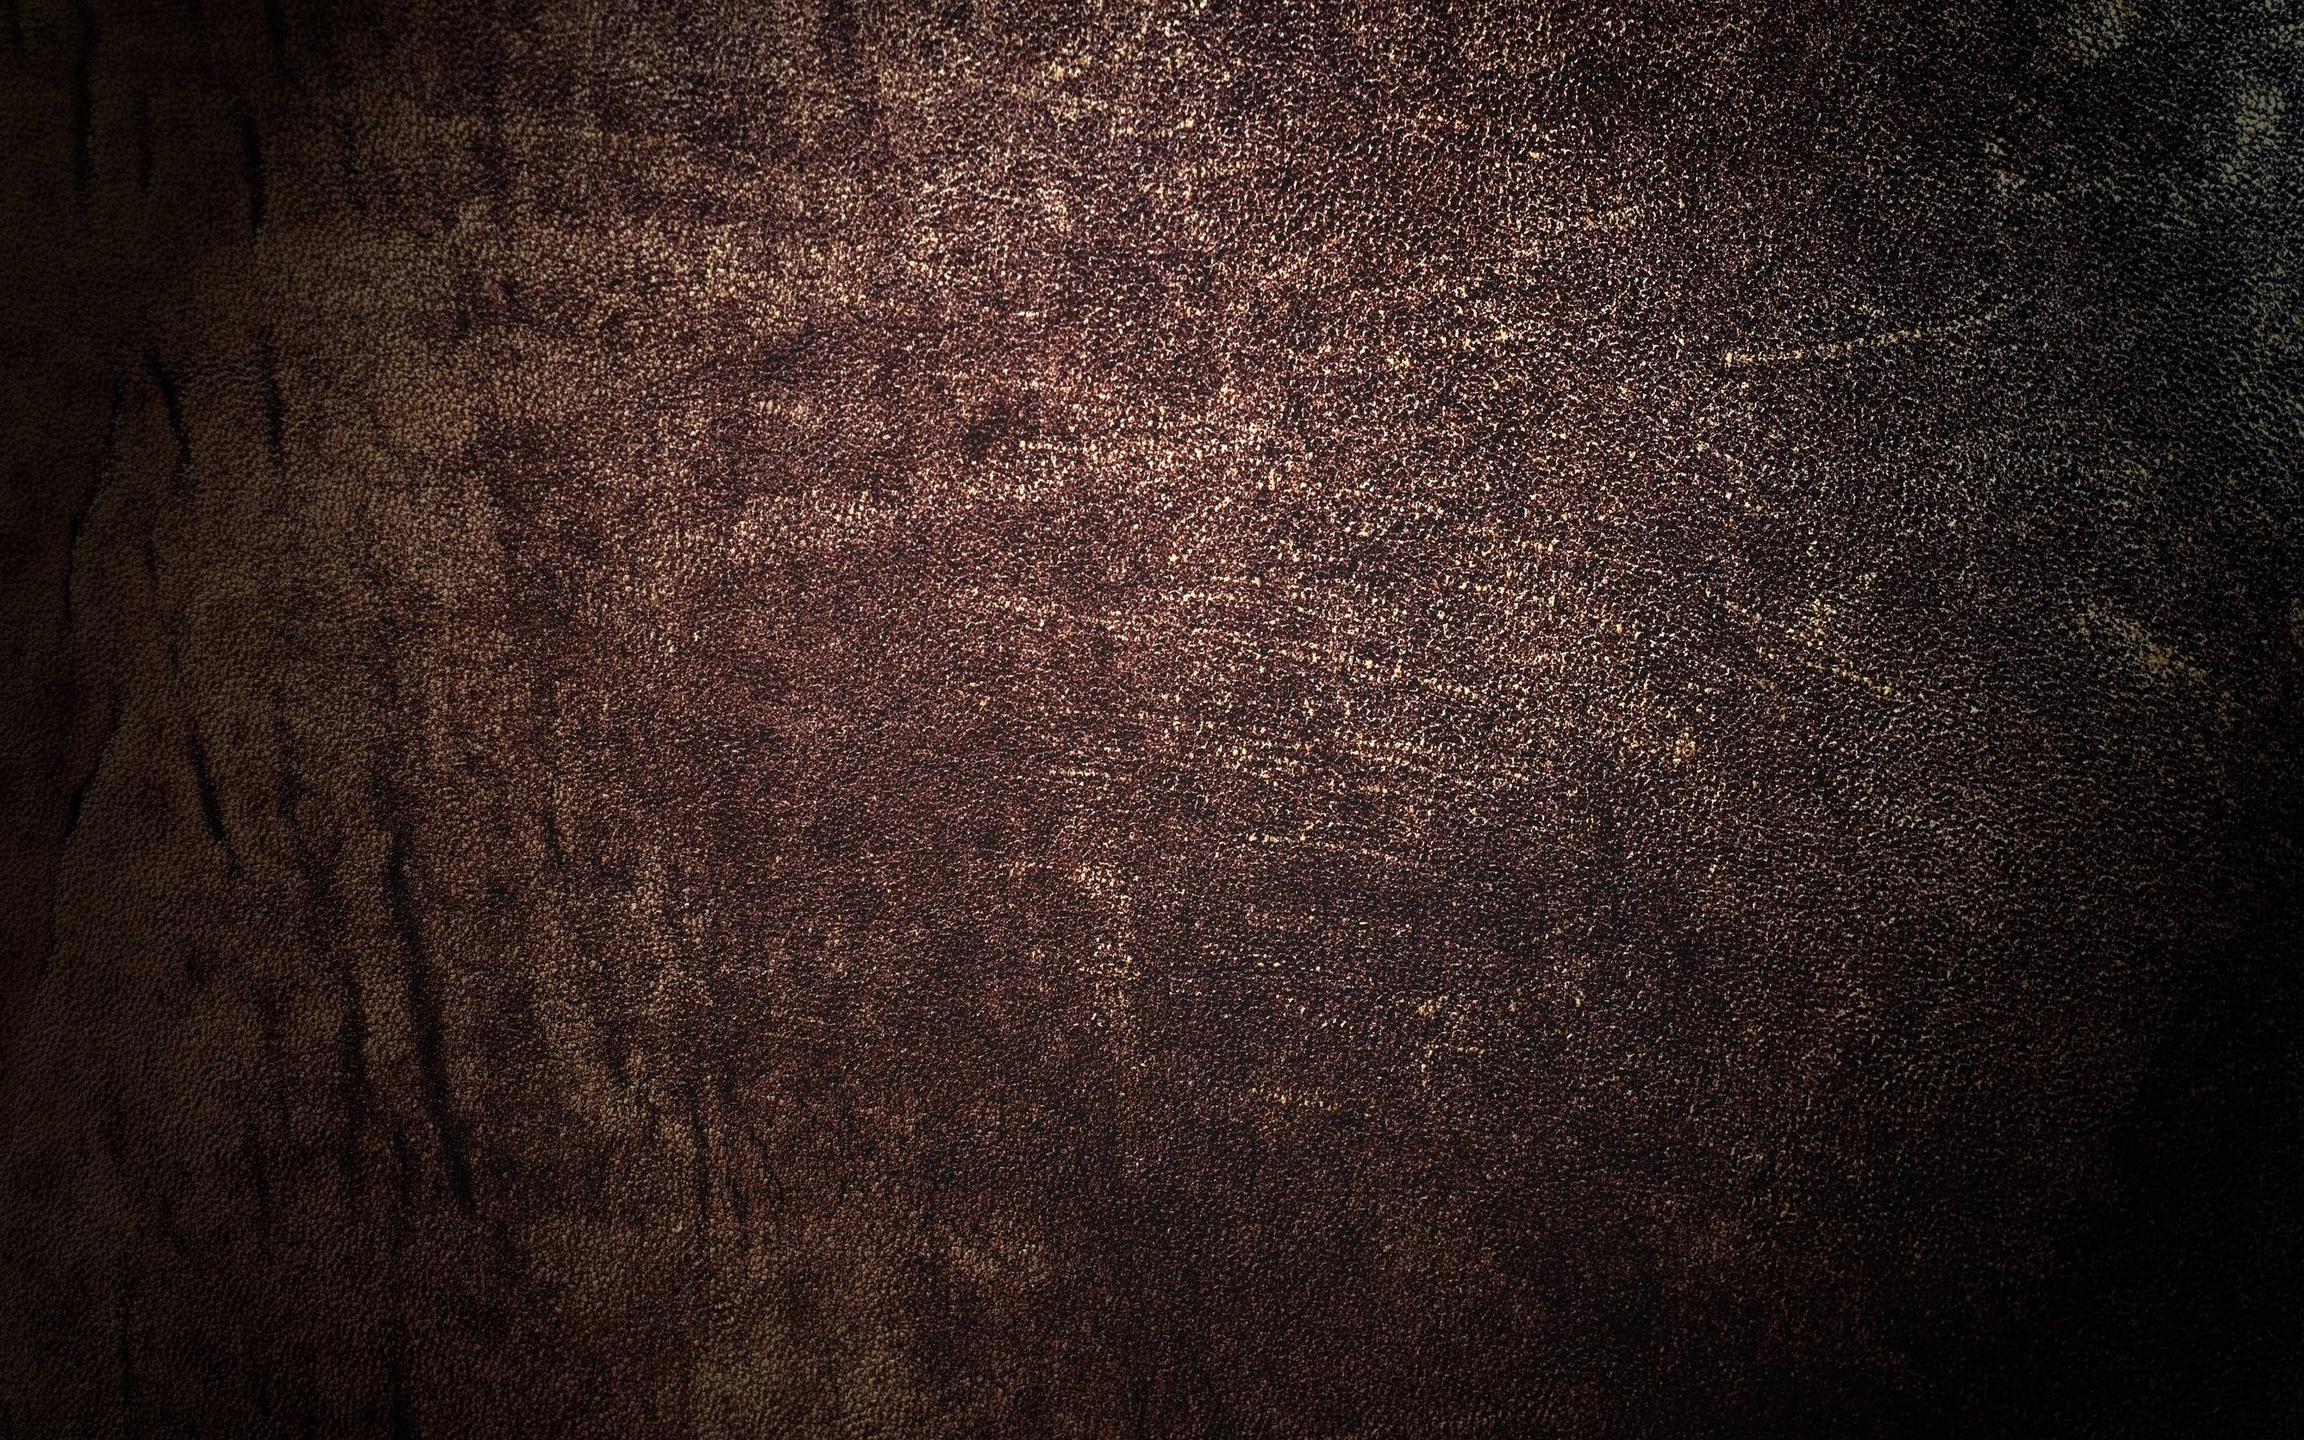 Textured Wallpaper Backgrounds  Wallpaper Cave